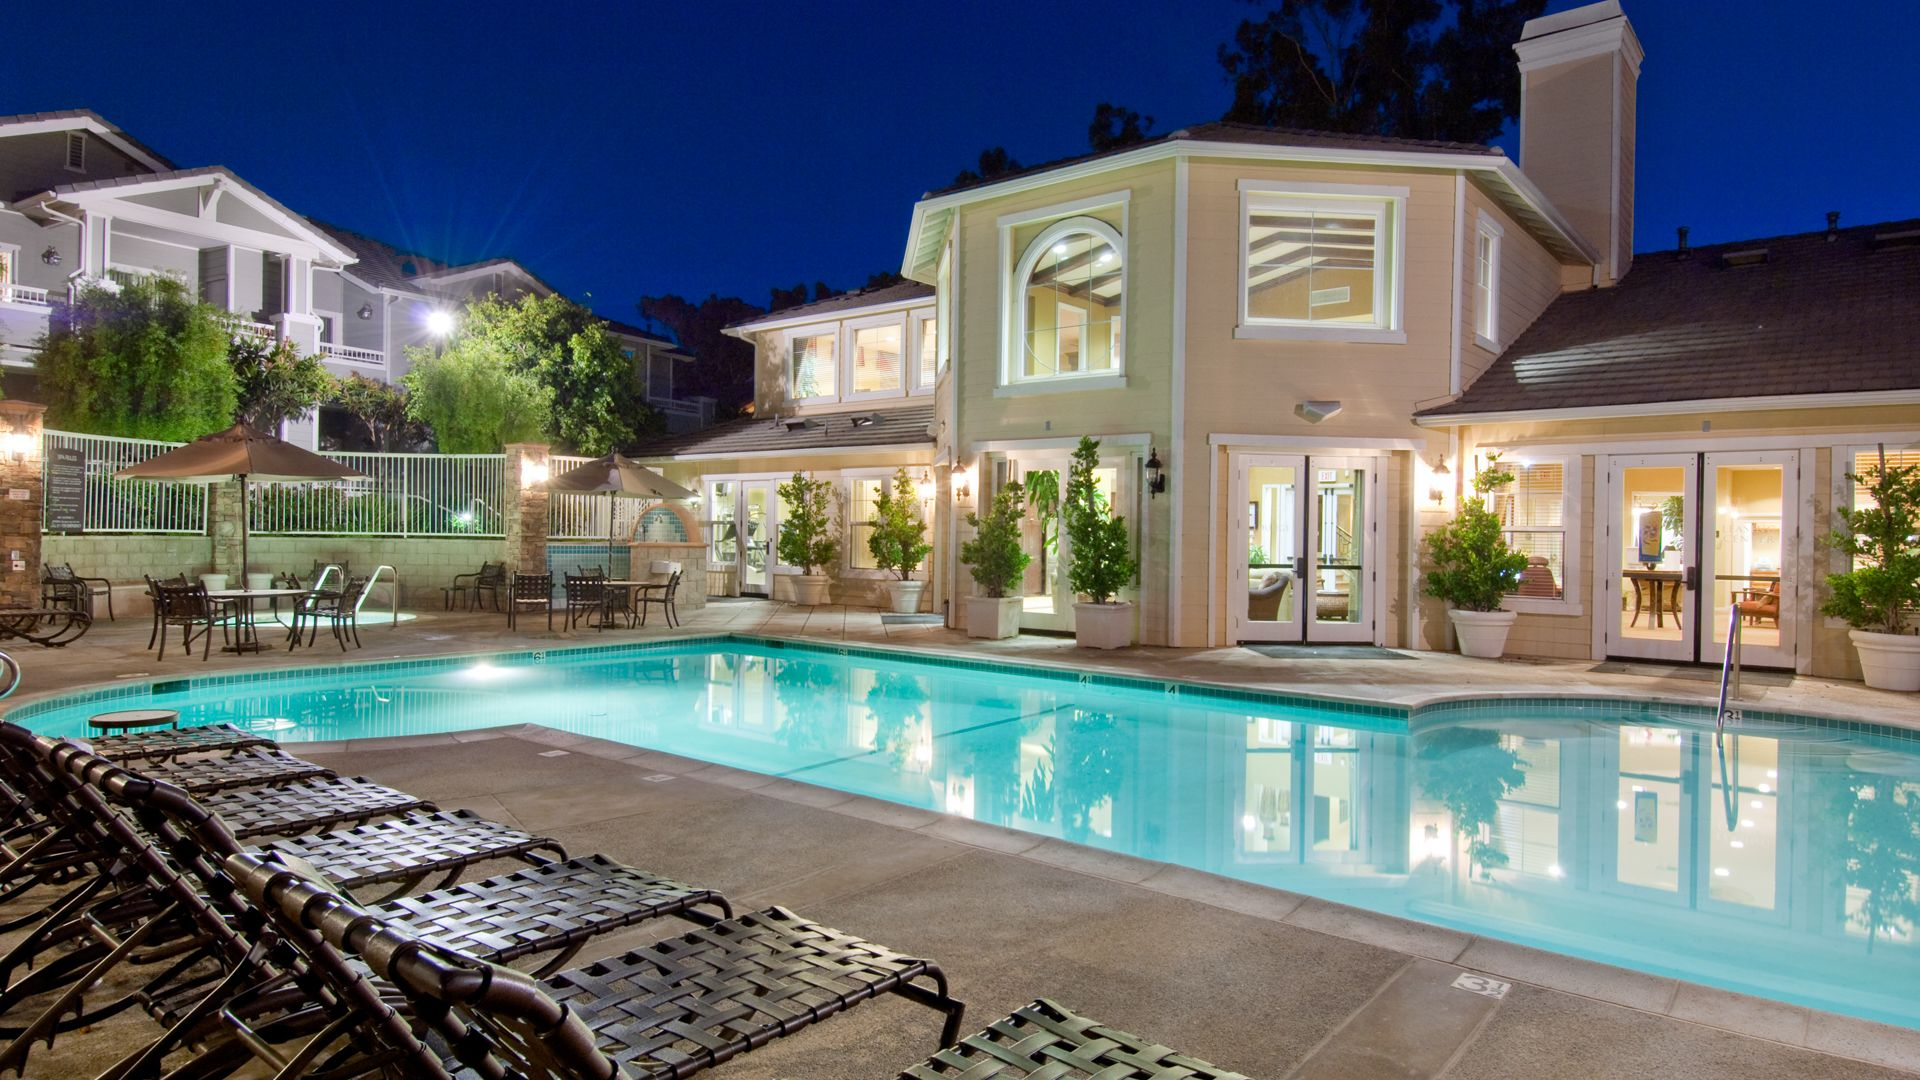 Via Ventura - Swimming Pool